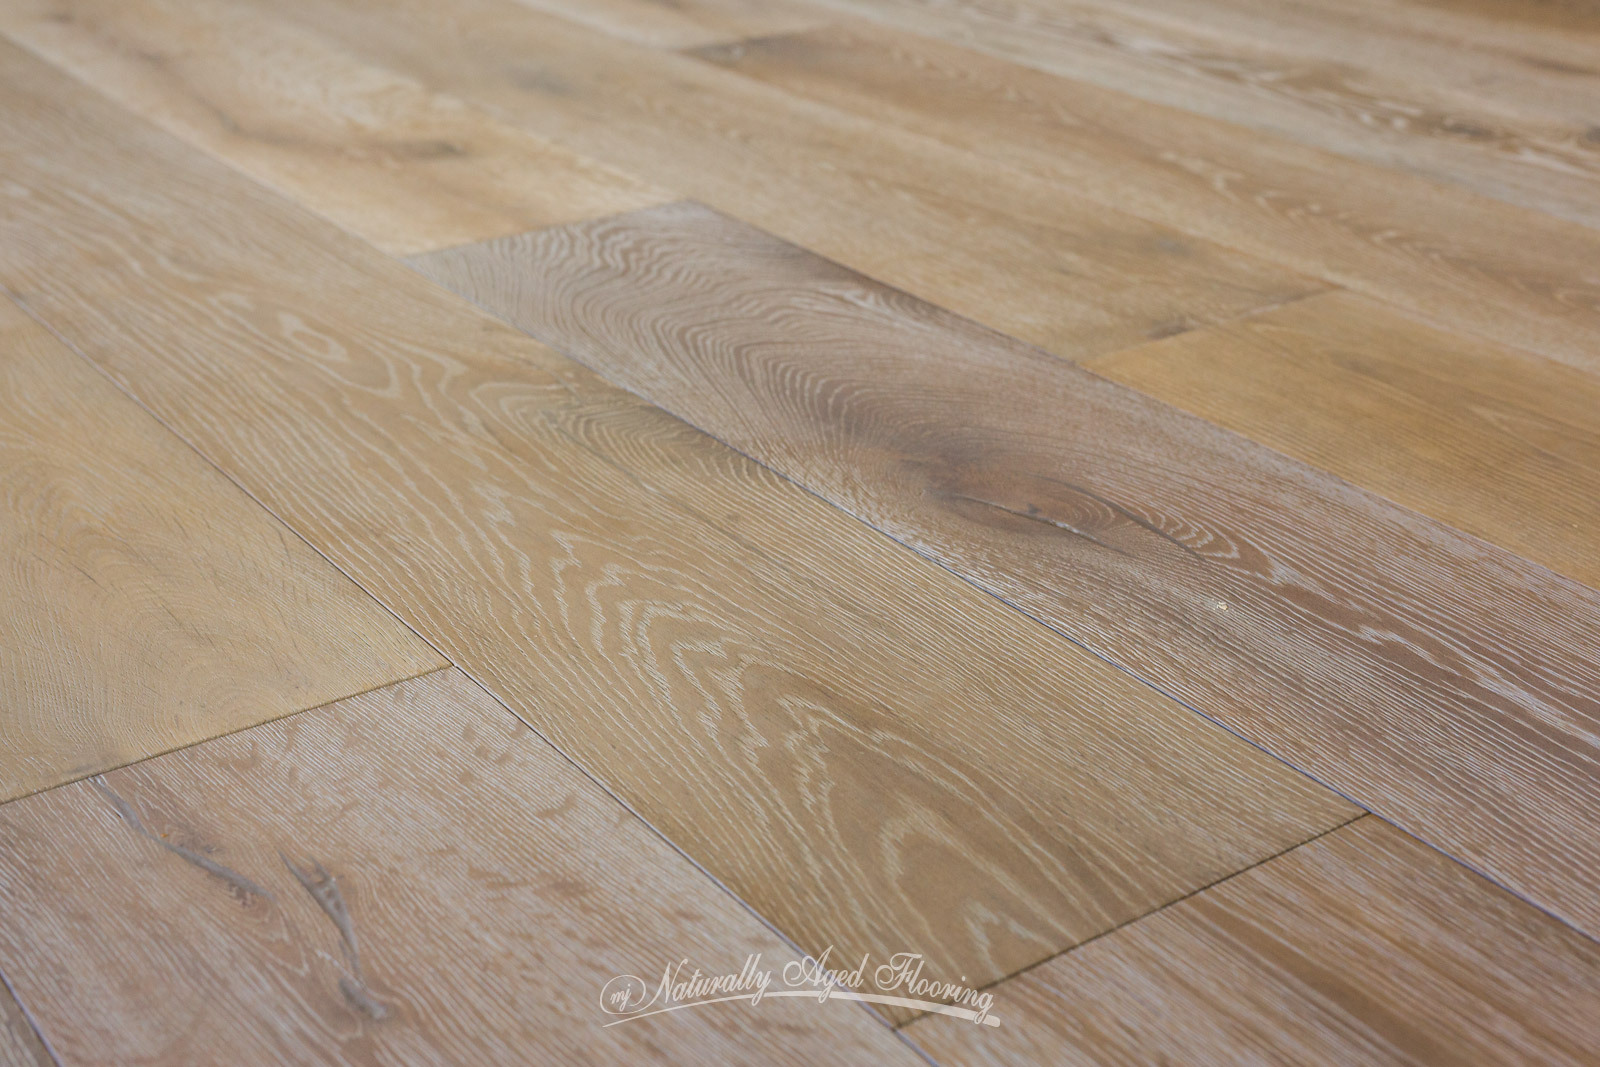 Naturally aged hardwood flooring gurus floor for Flooring gallery